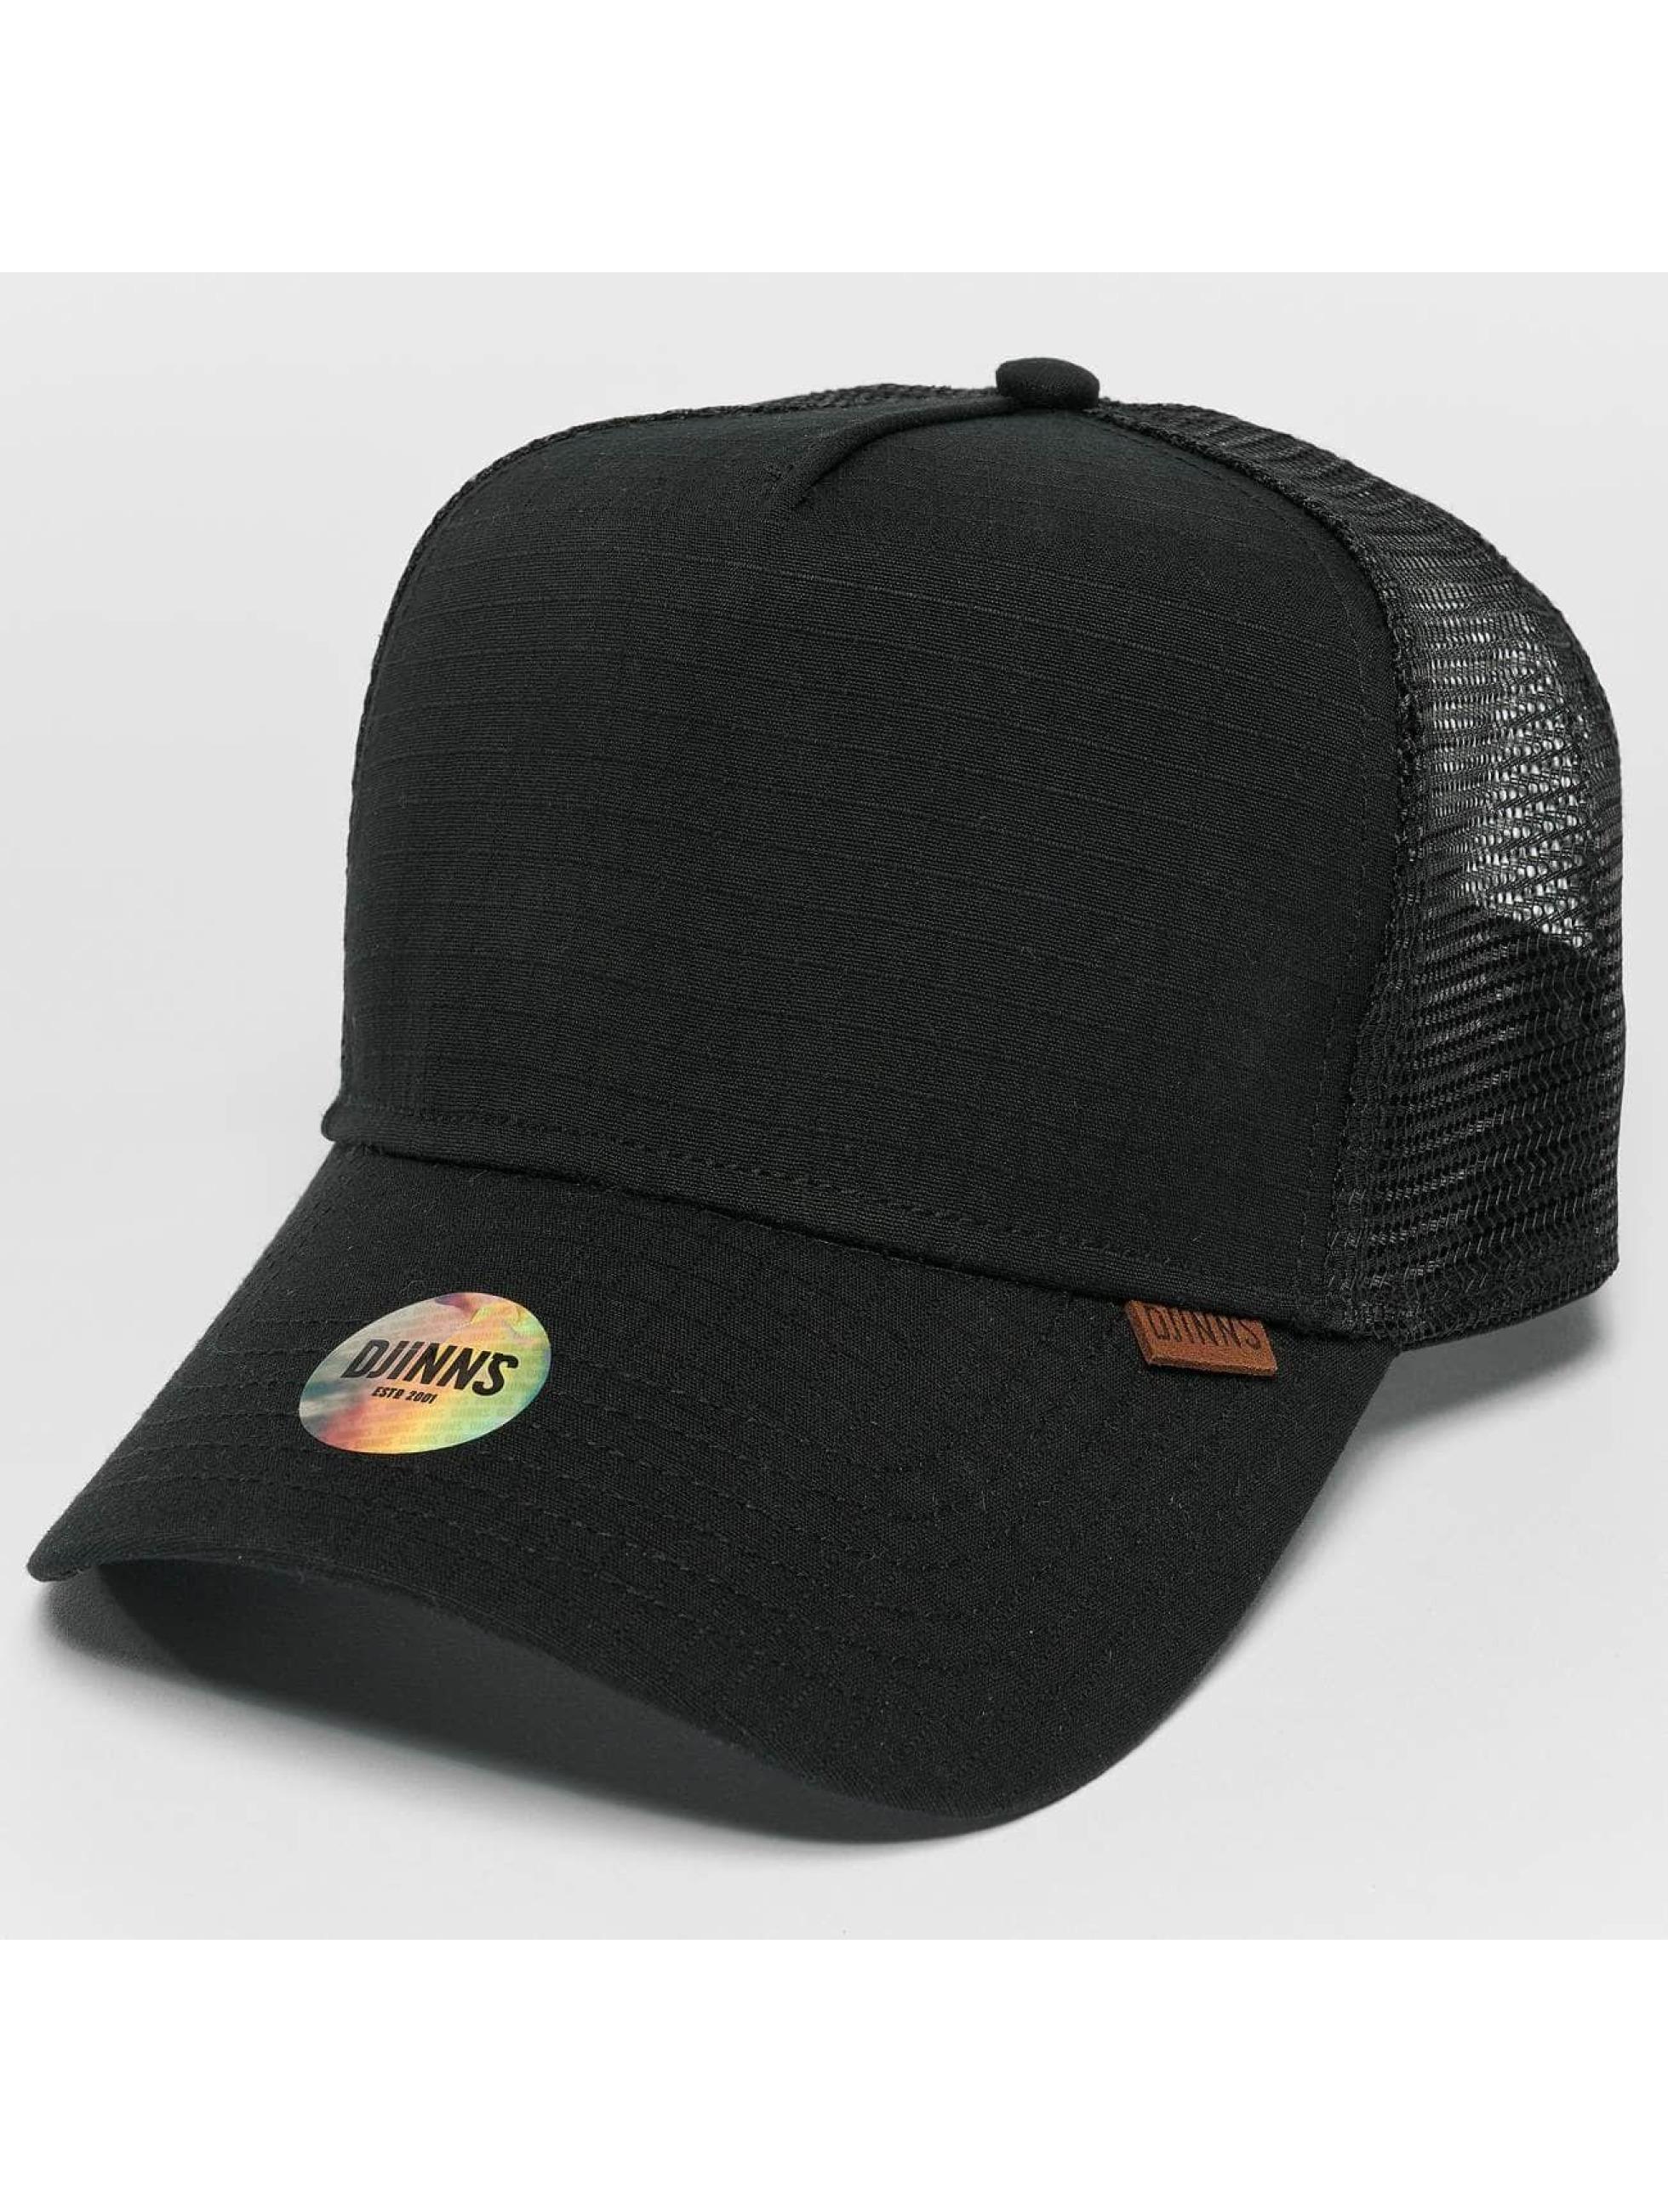 Djinns Trucker Caps M-Rib Stop High sort